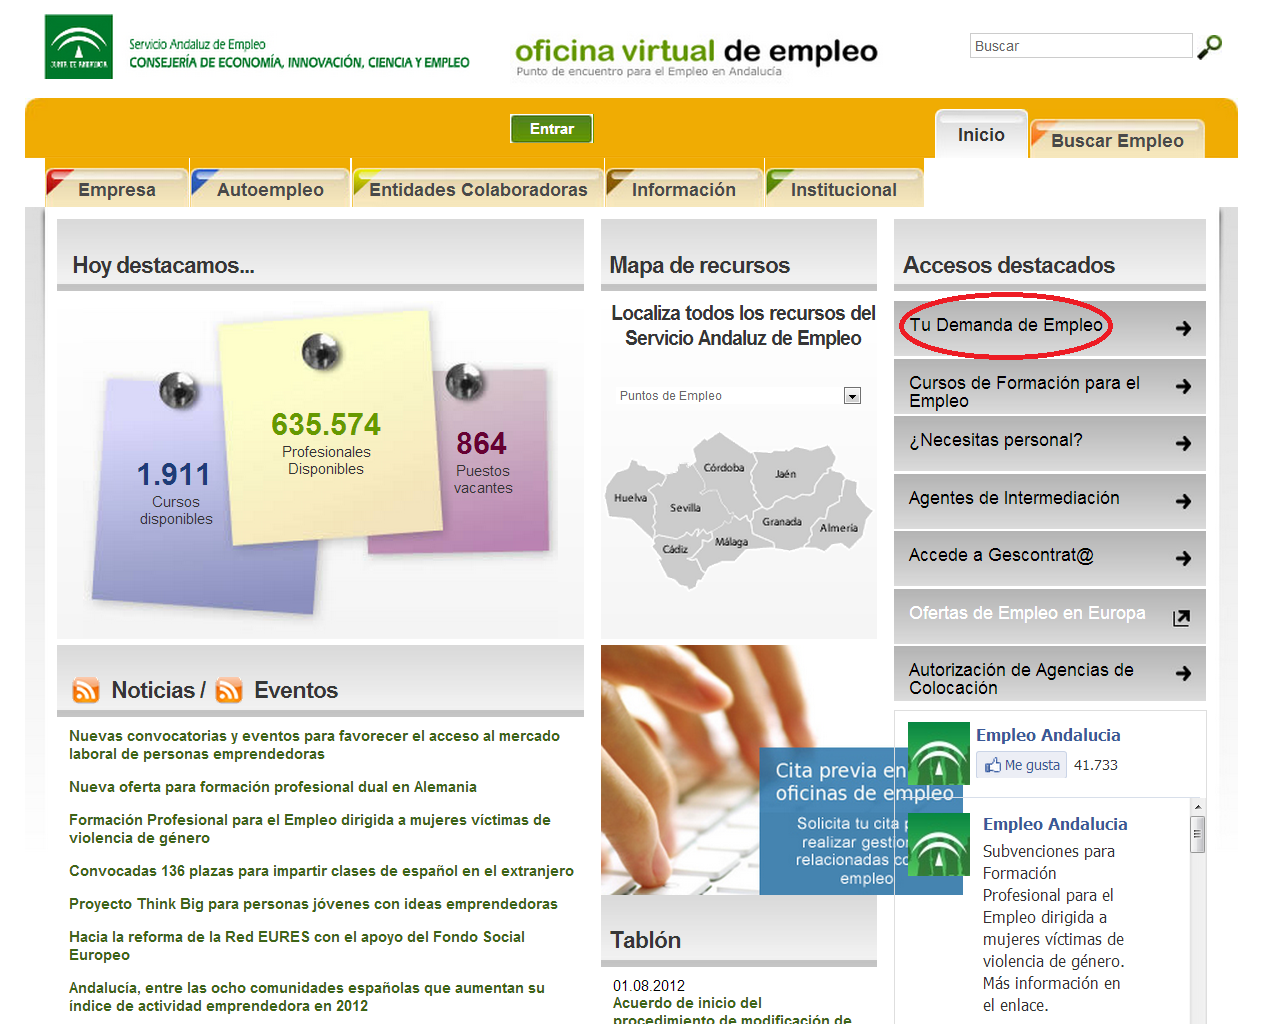 Pasos a seguir para renovar la demanda de empleo por internet tecnoinfe - Oficina de empleo andalucia ...